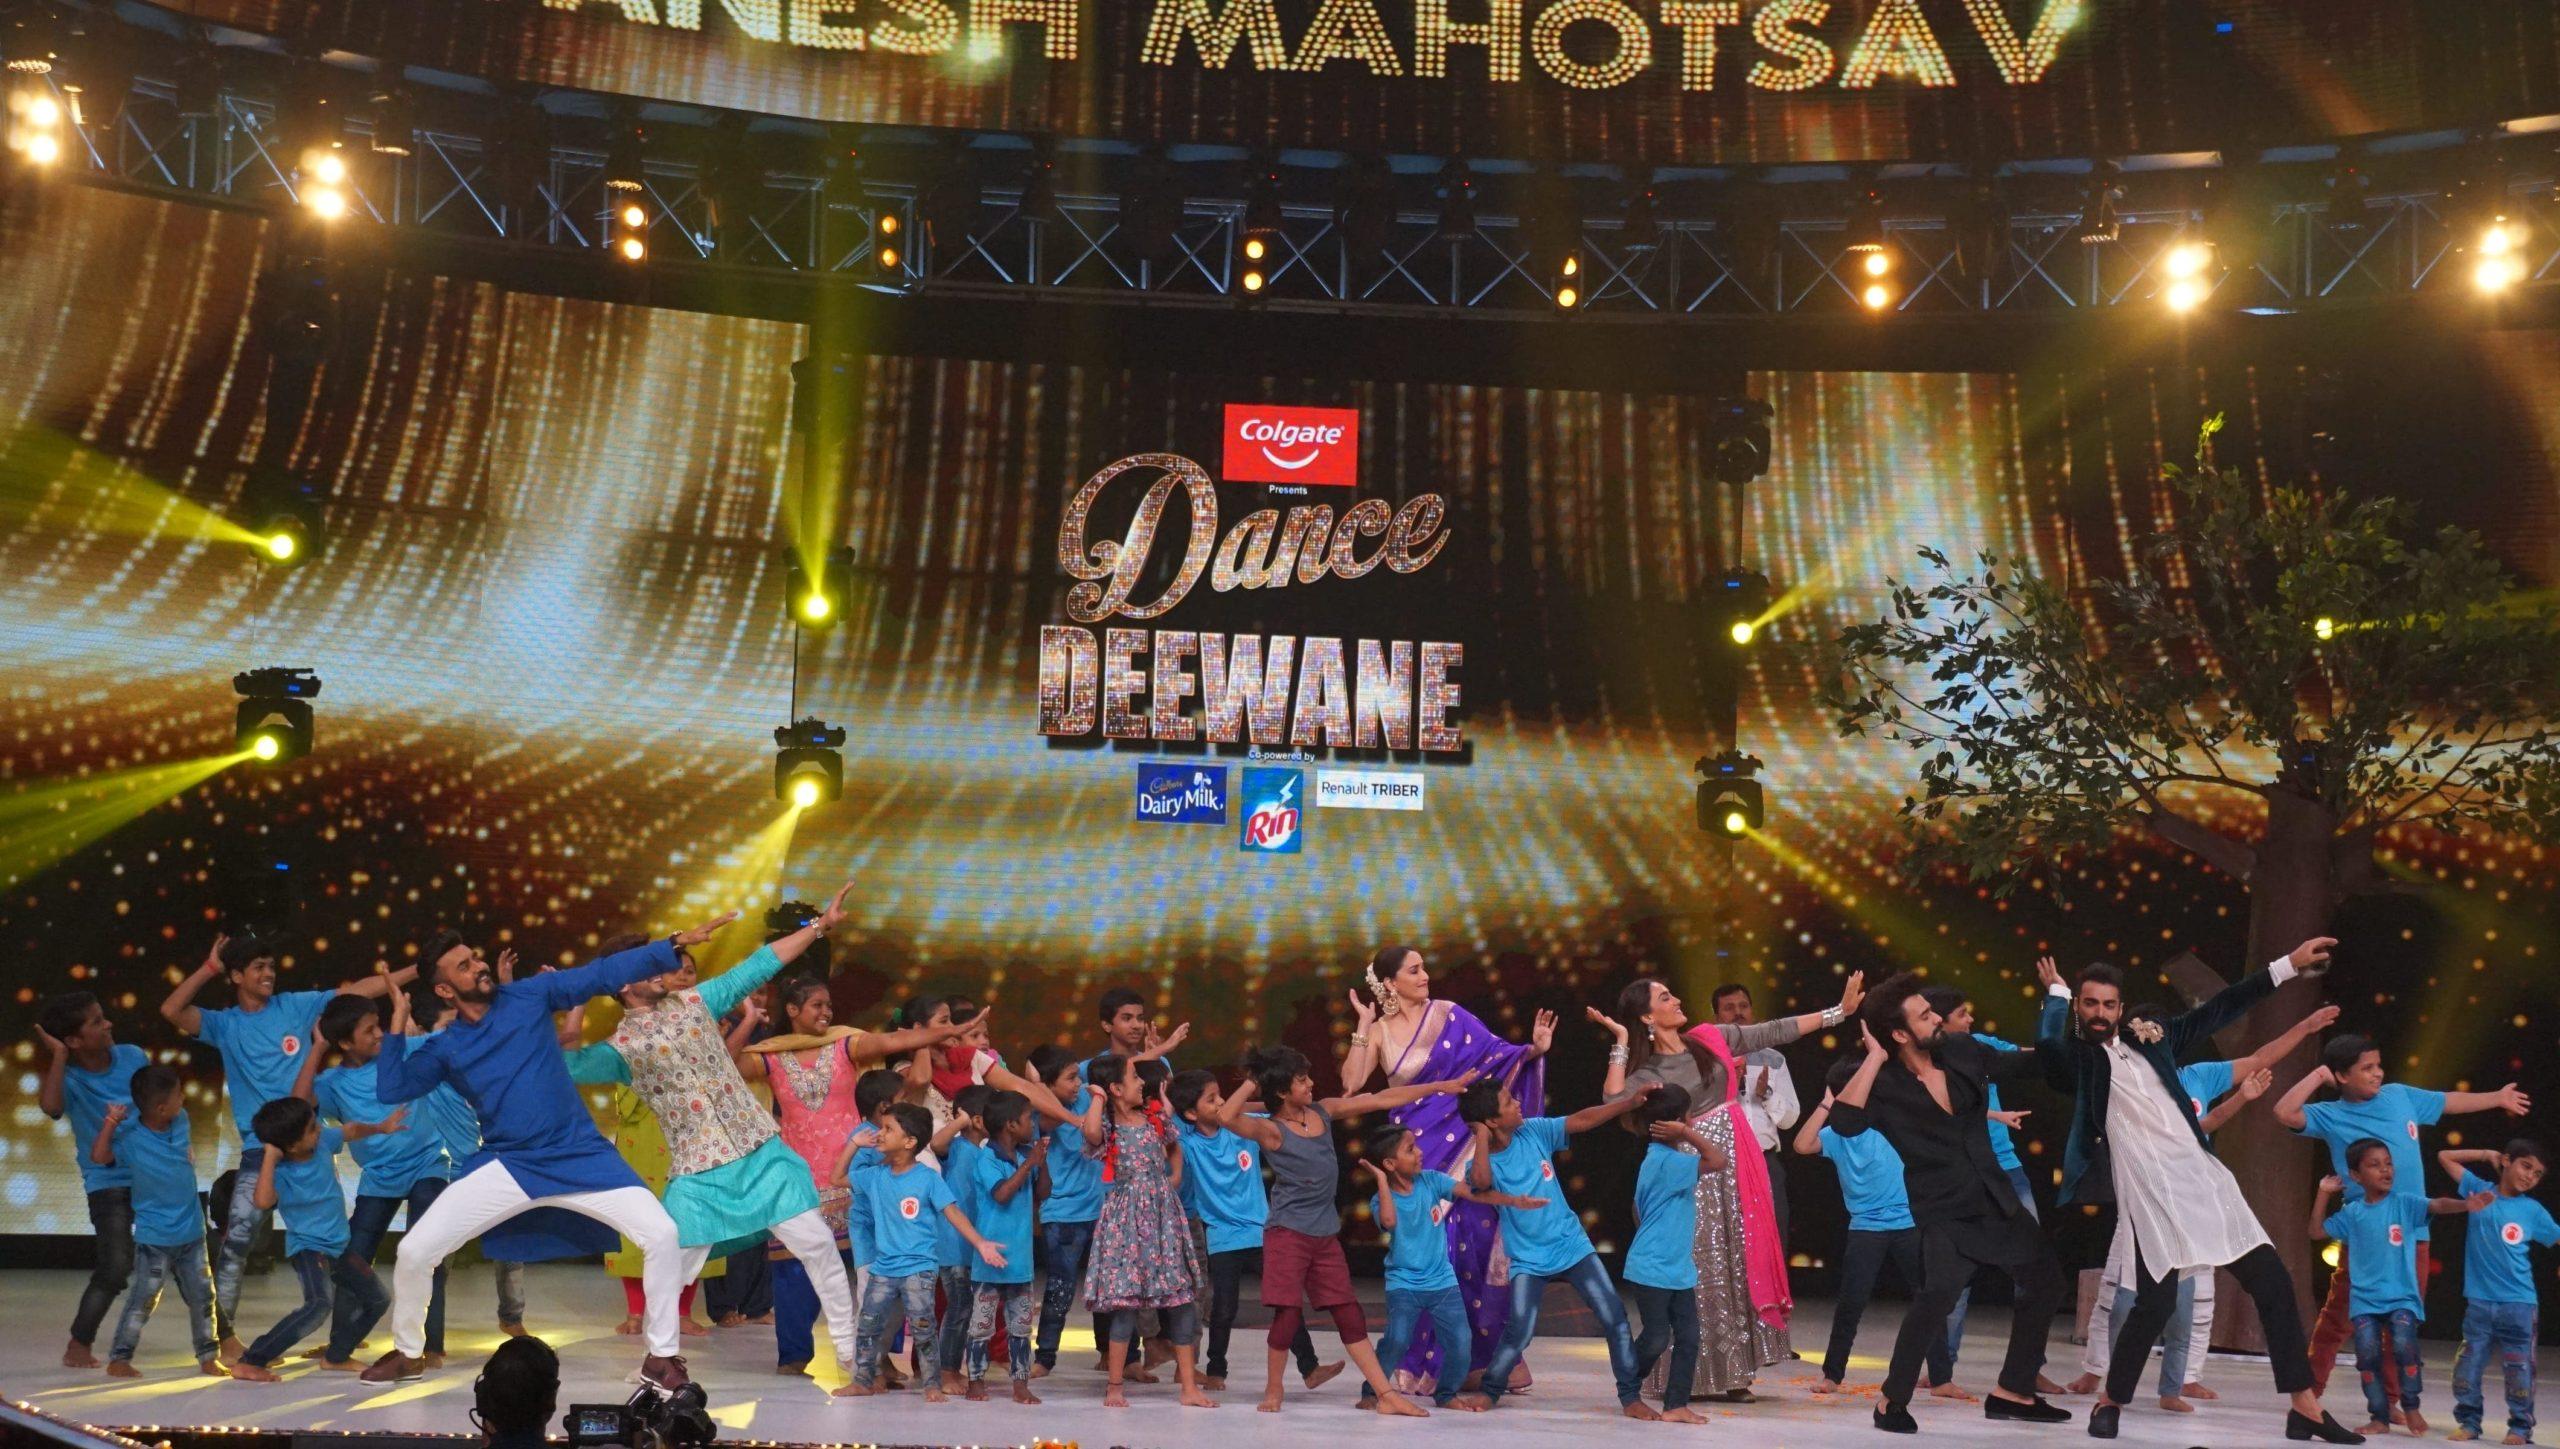 A trip down the Dance Deewane 2 lane!